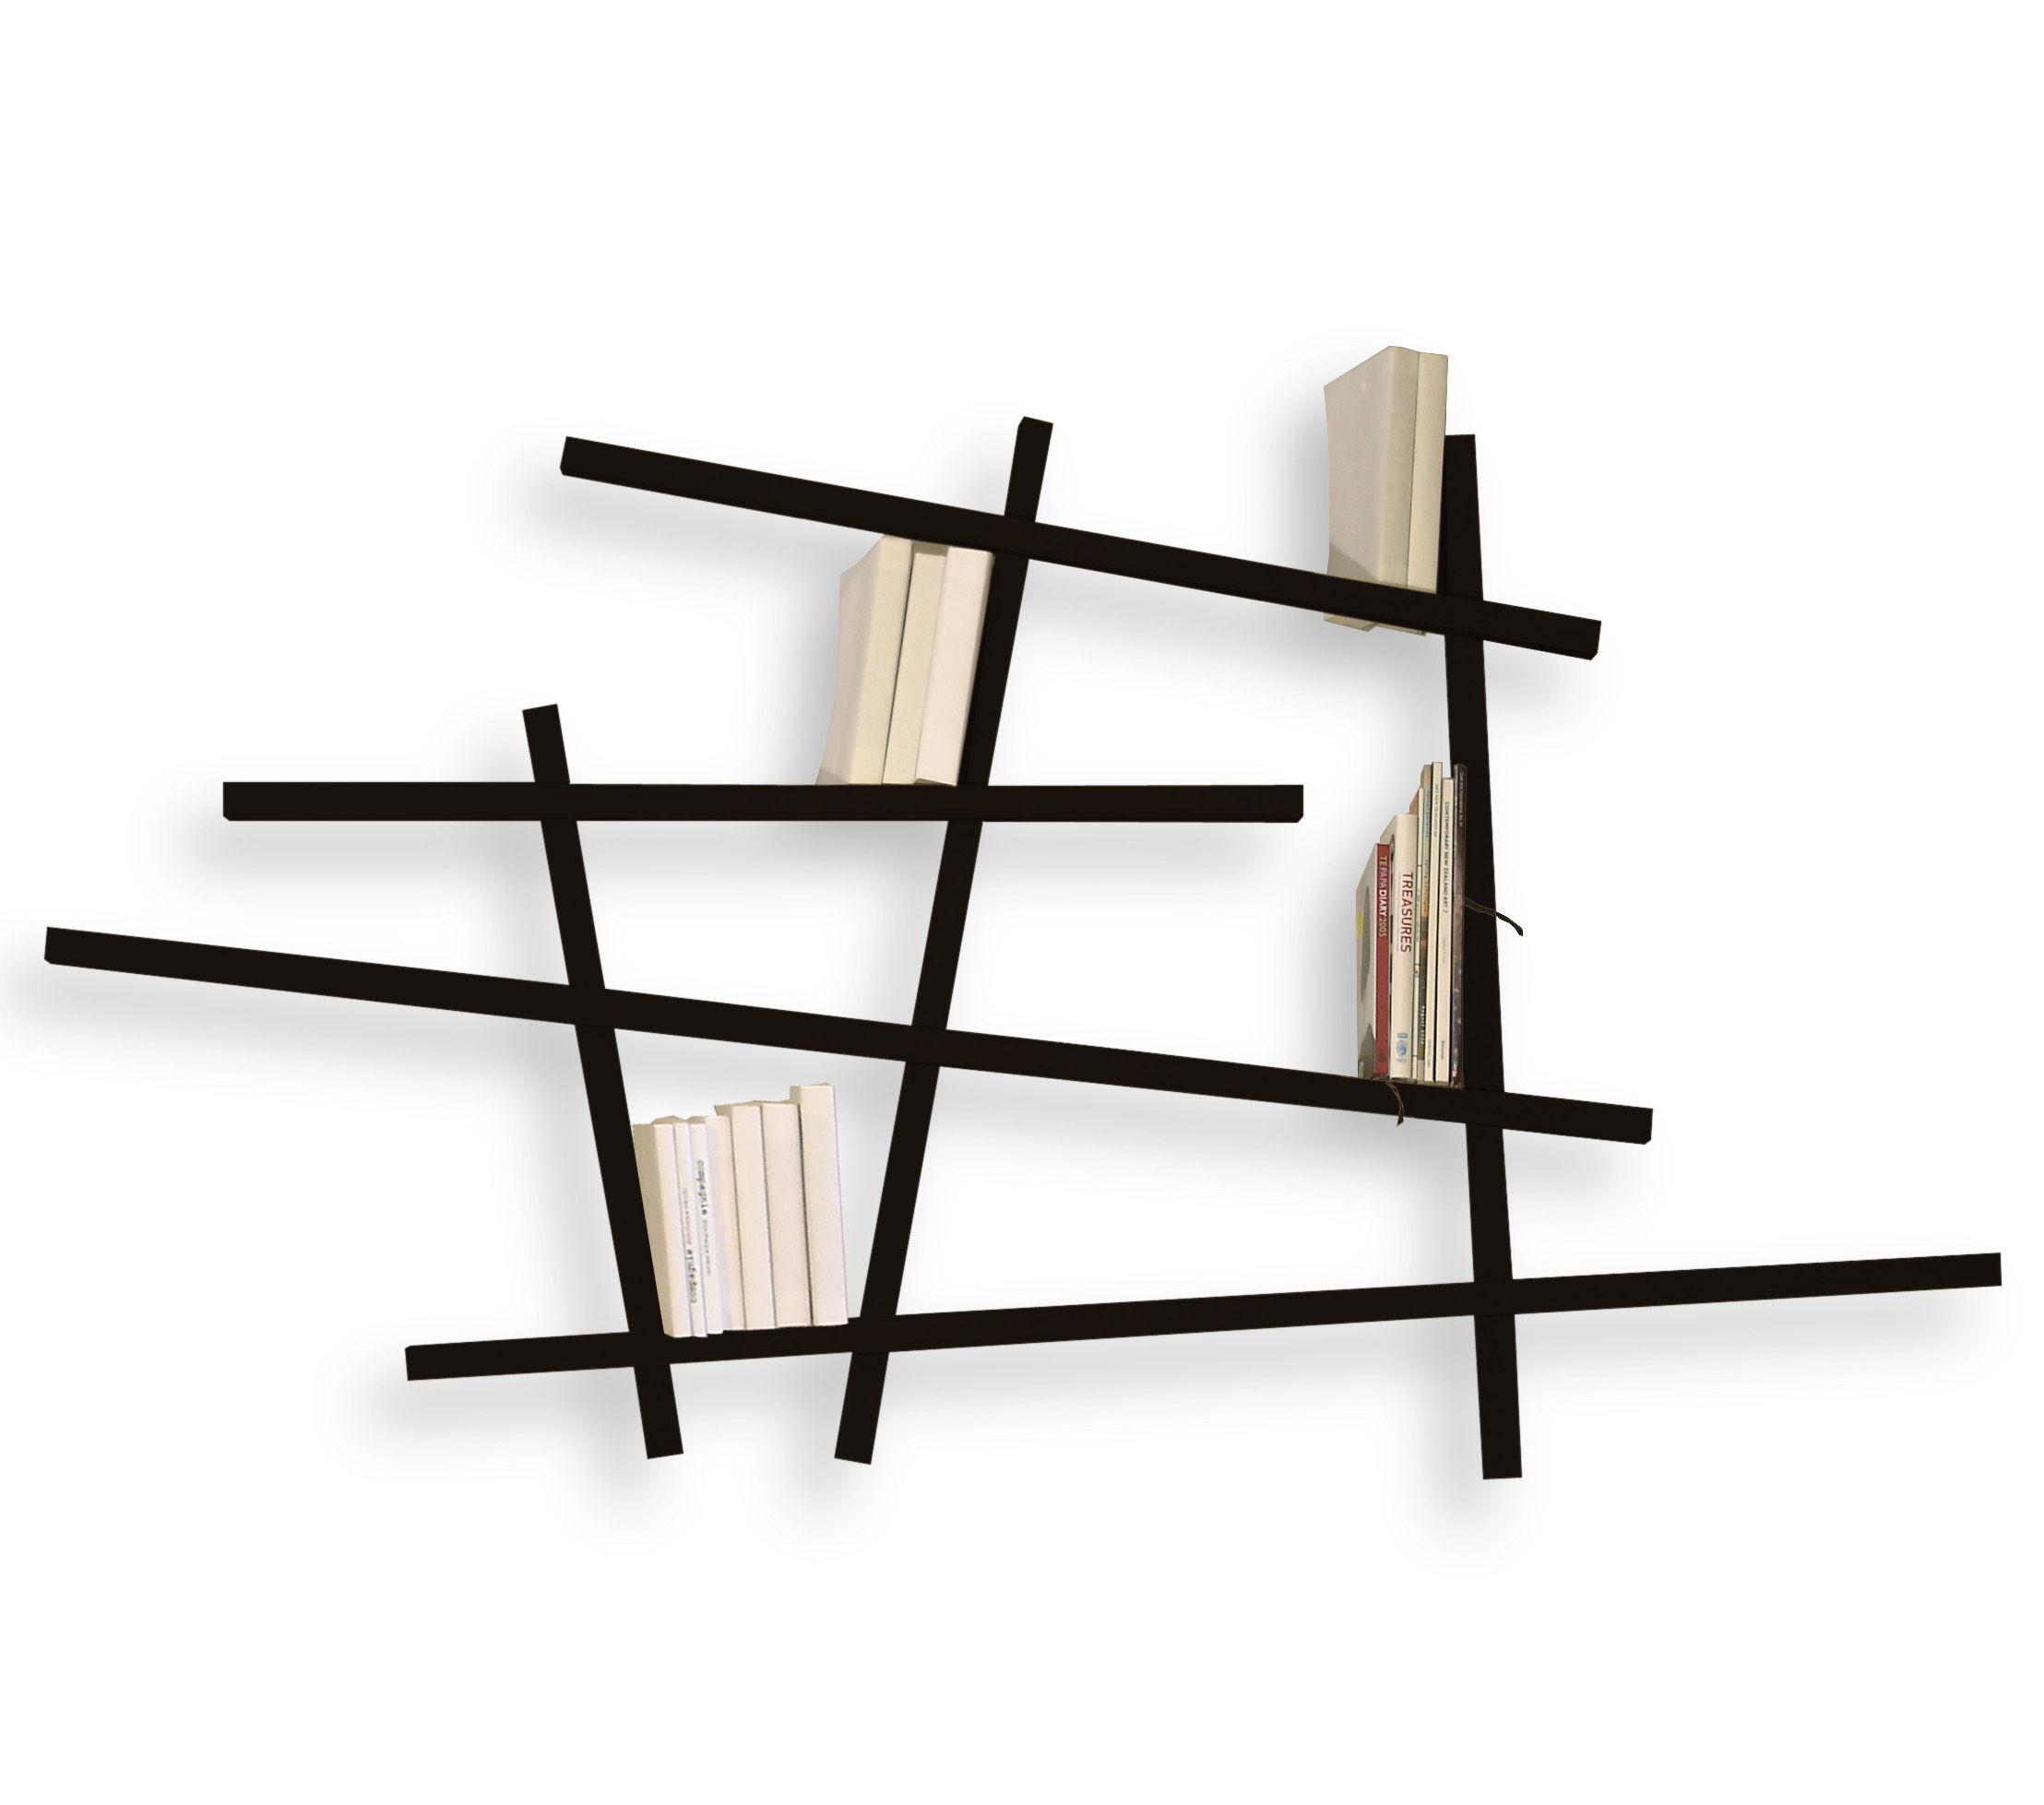 mikado farbig kleines modell compagnie b cherregal. Black Bedroom Furniture Sets. Home Design Ideas